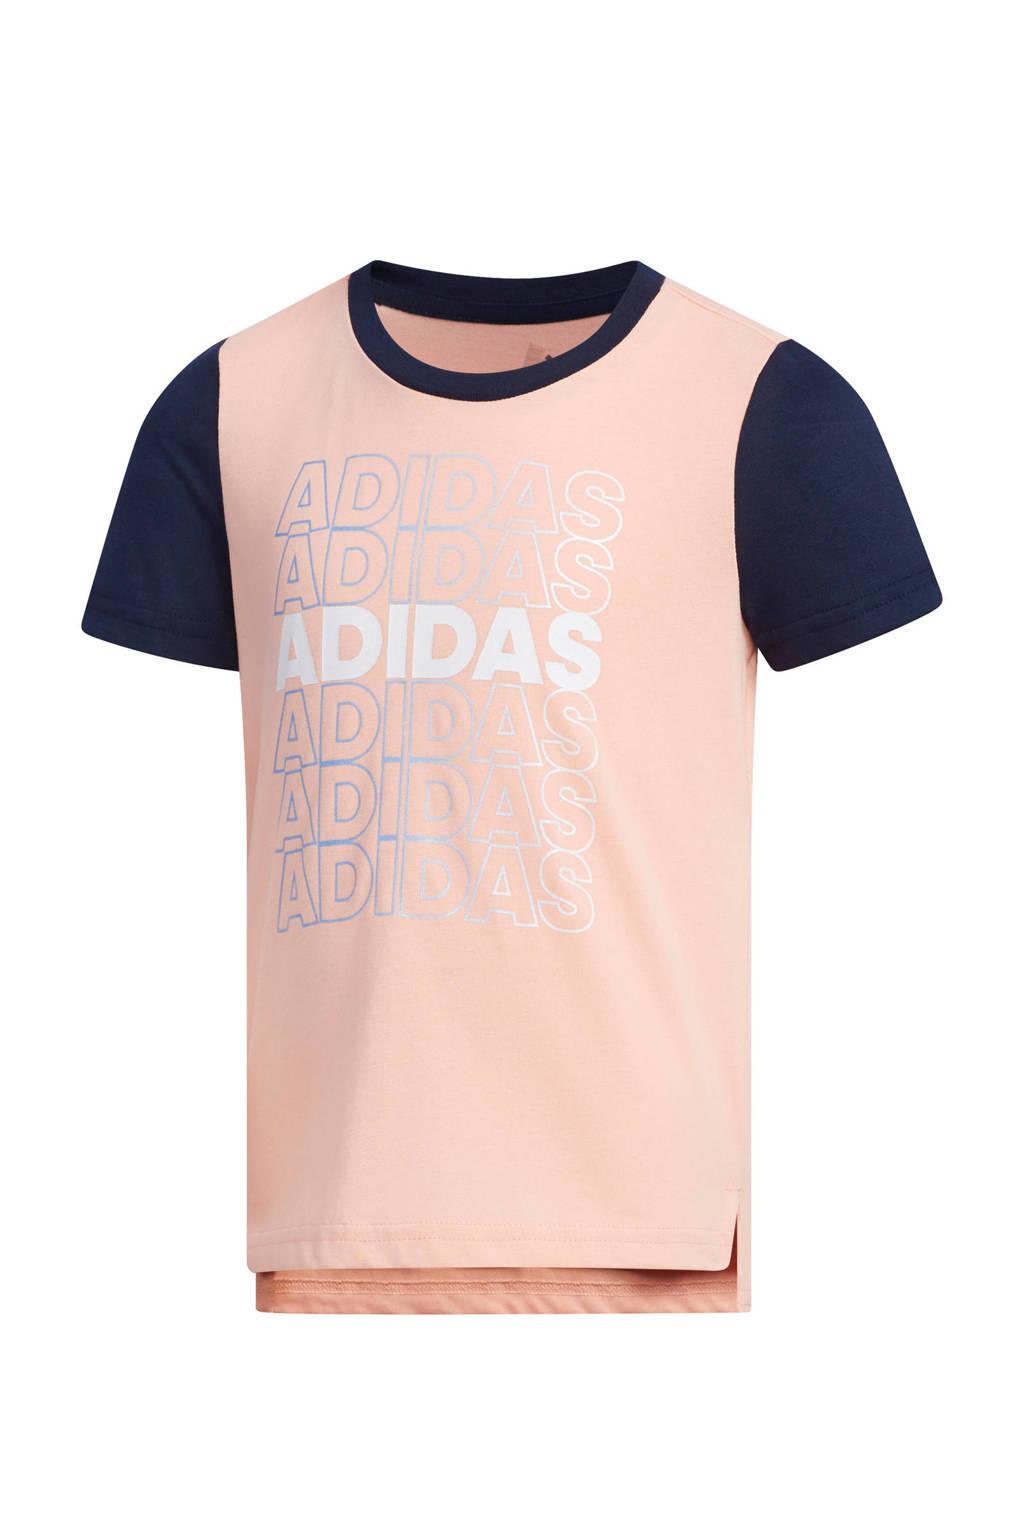 adidas sport T-shirt roze, Roze/donkerblauw